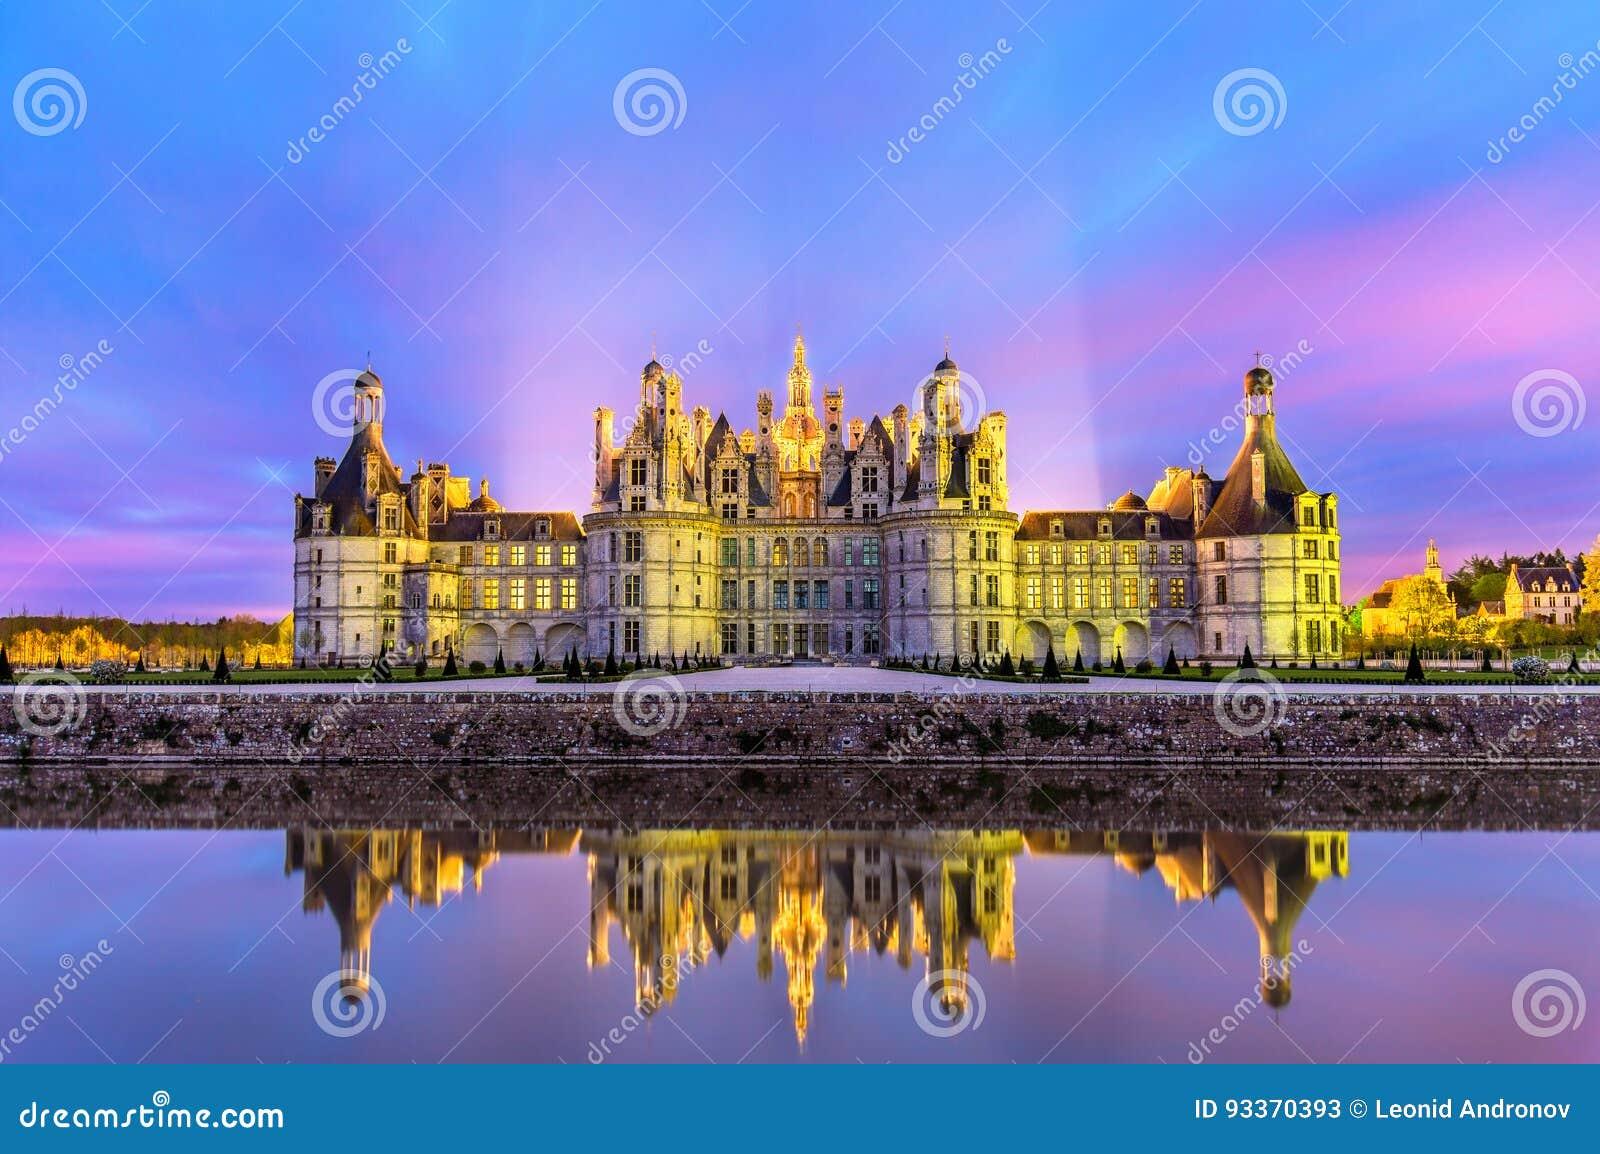 Chateau de Chambord, το μεγαλύτερο κάστρο στην κοιλάδα της Loire - Γαλλία